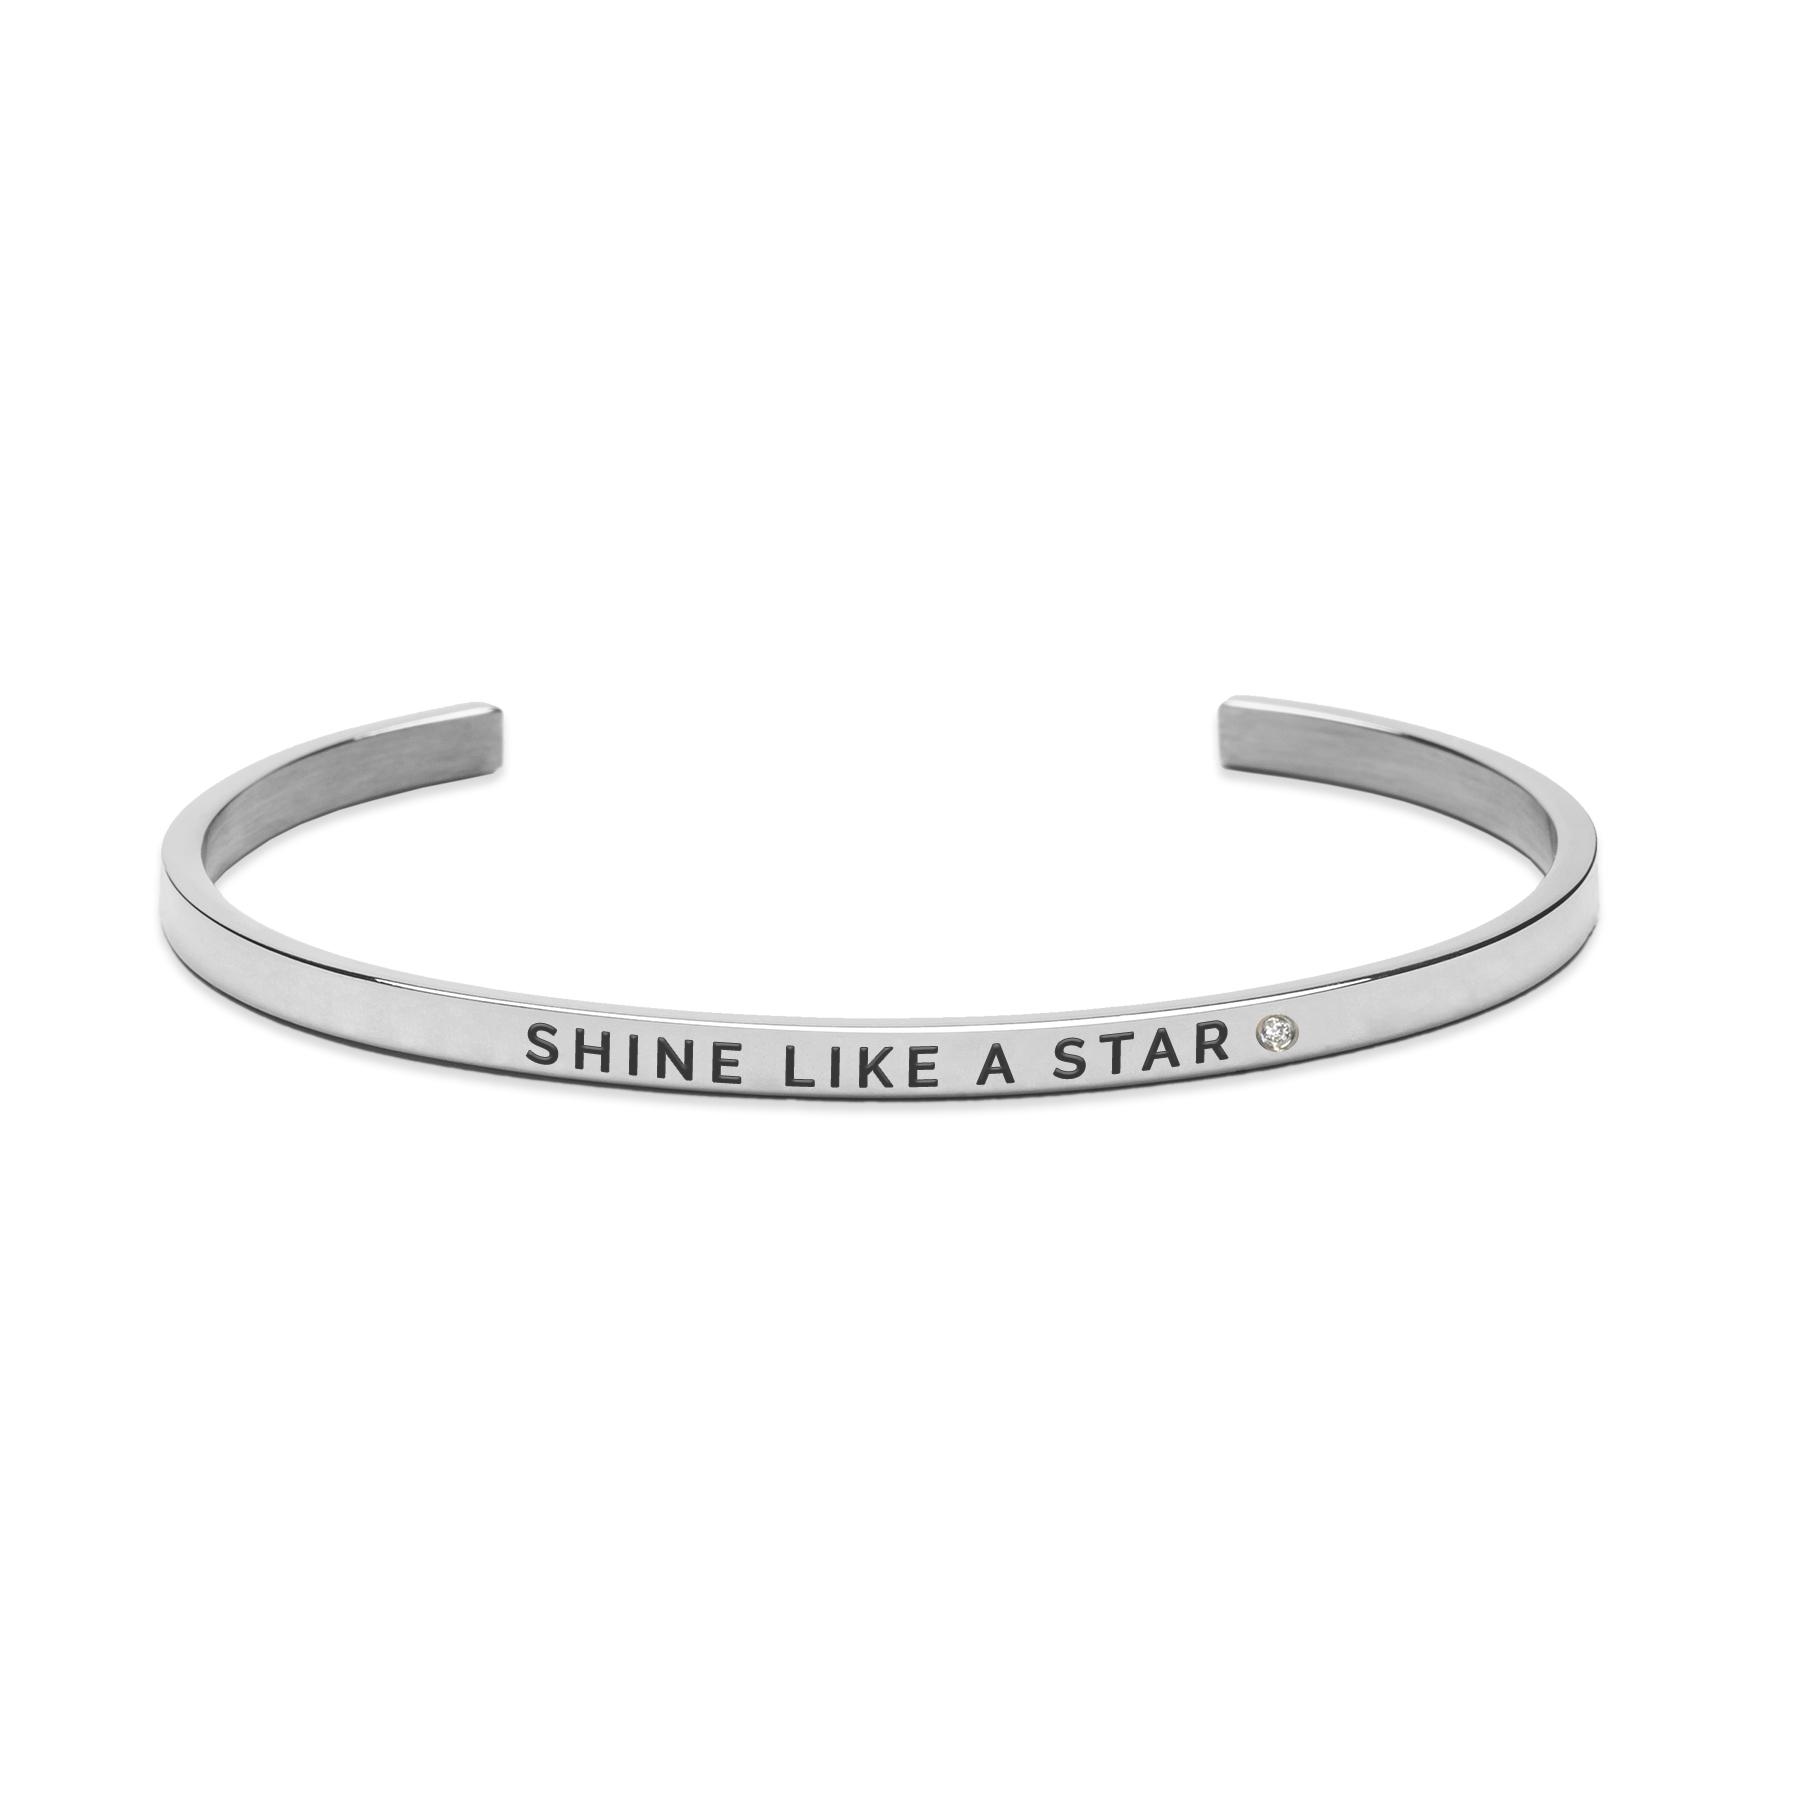 Shine like a star / XS